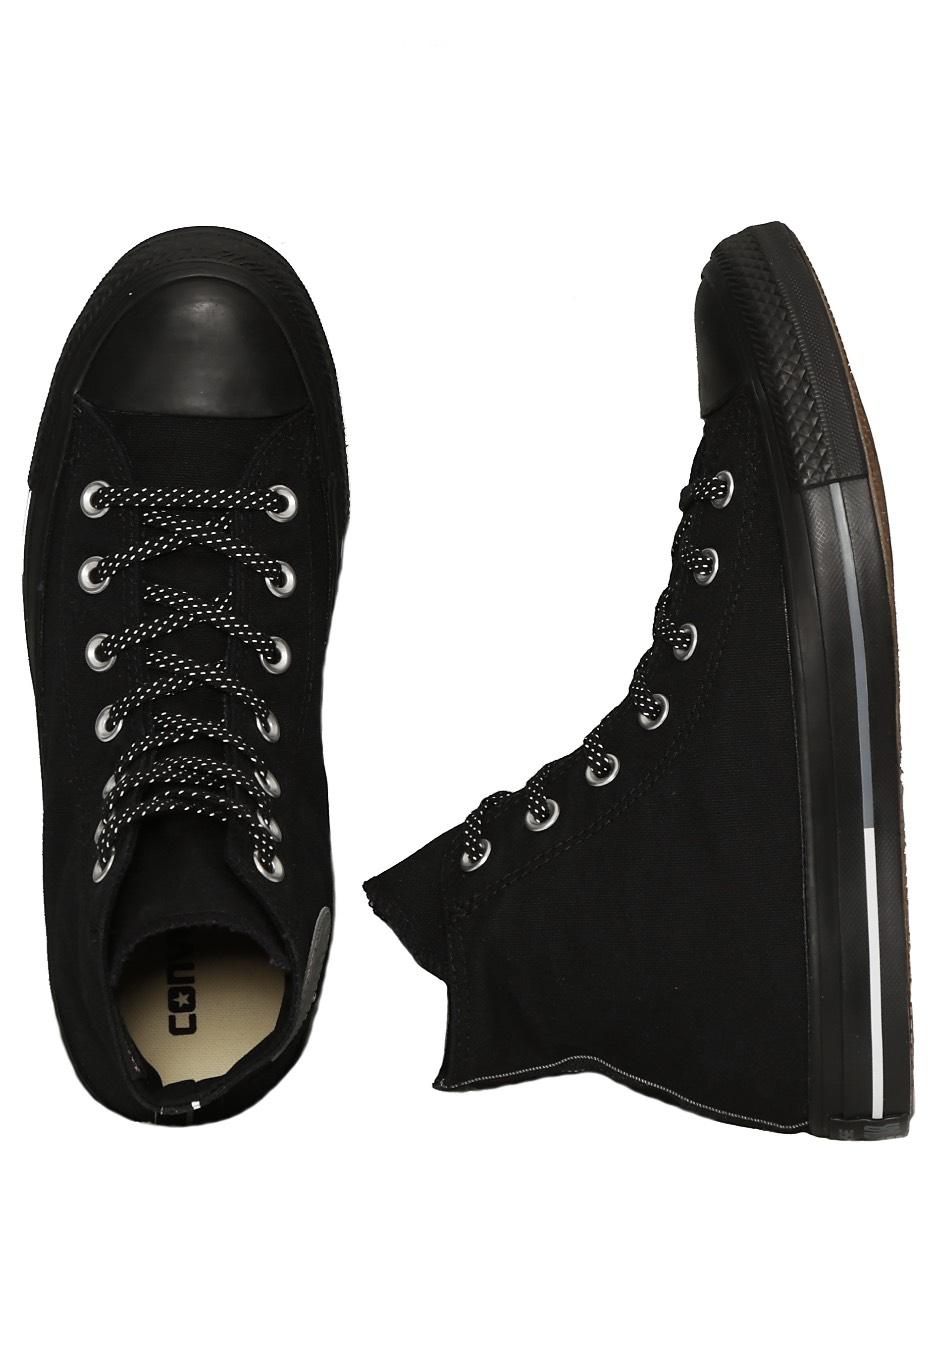 01c50778cf4ebf Converse - Chuck Taylor All Star Shield Canvas Hi Black White Manson - Girl  Shoes - Impericon.com UK